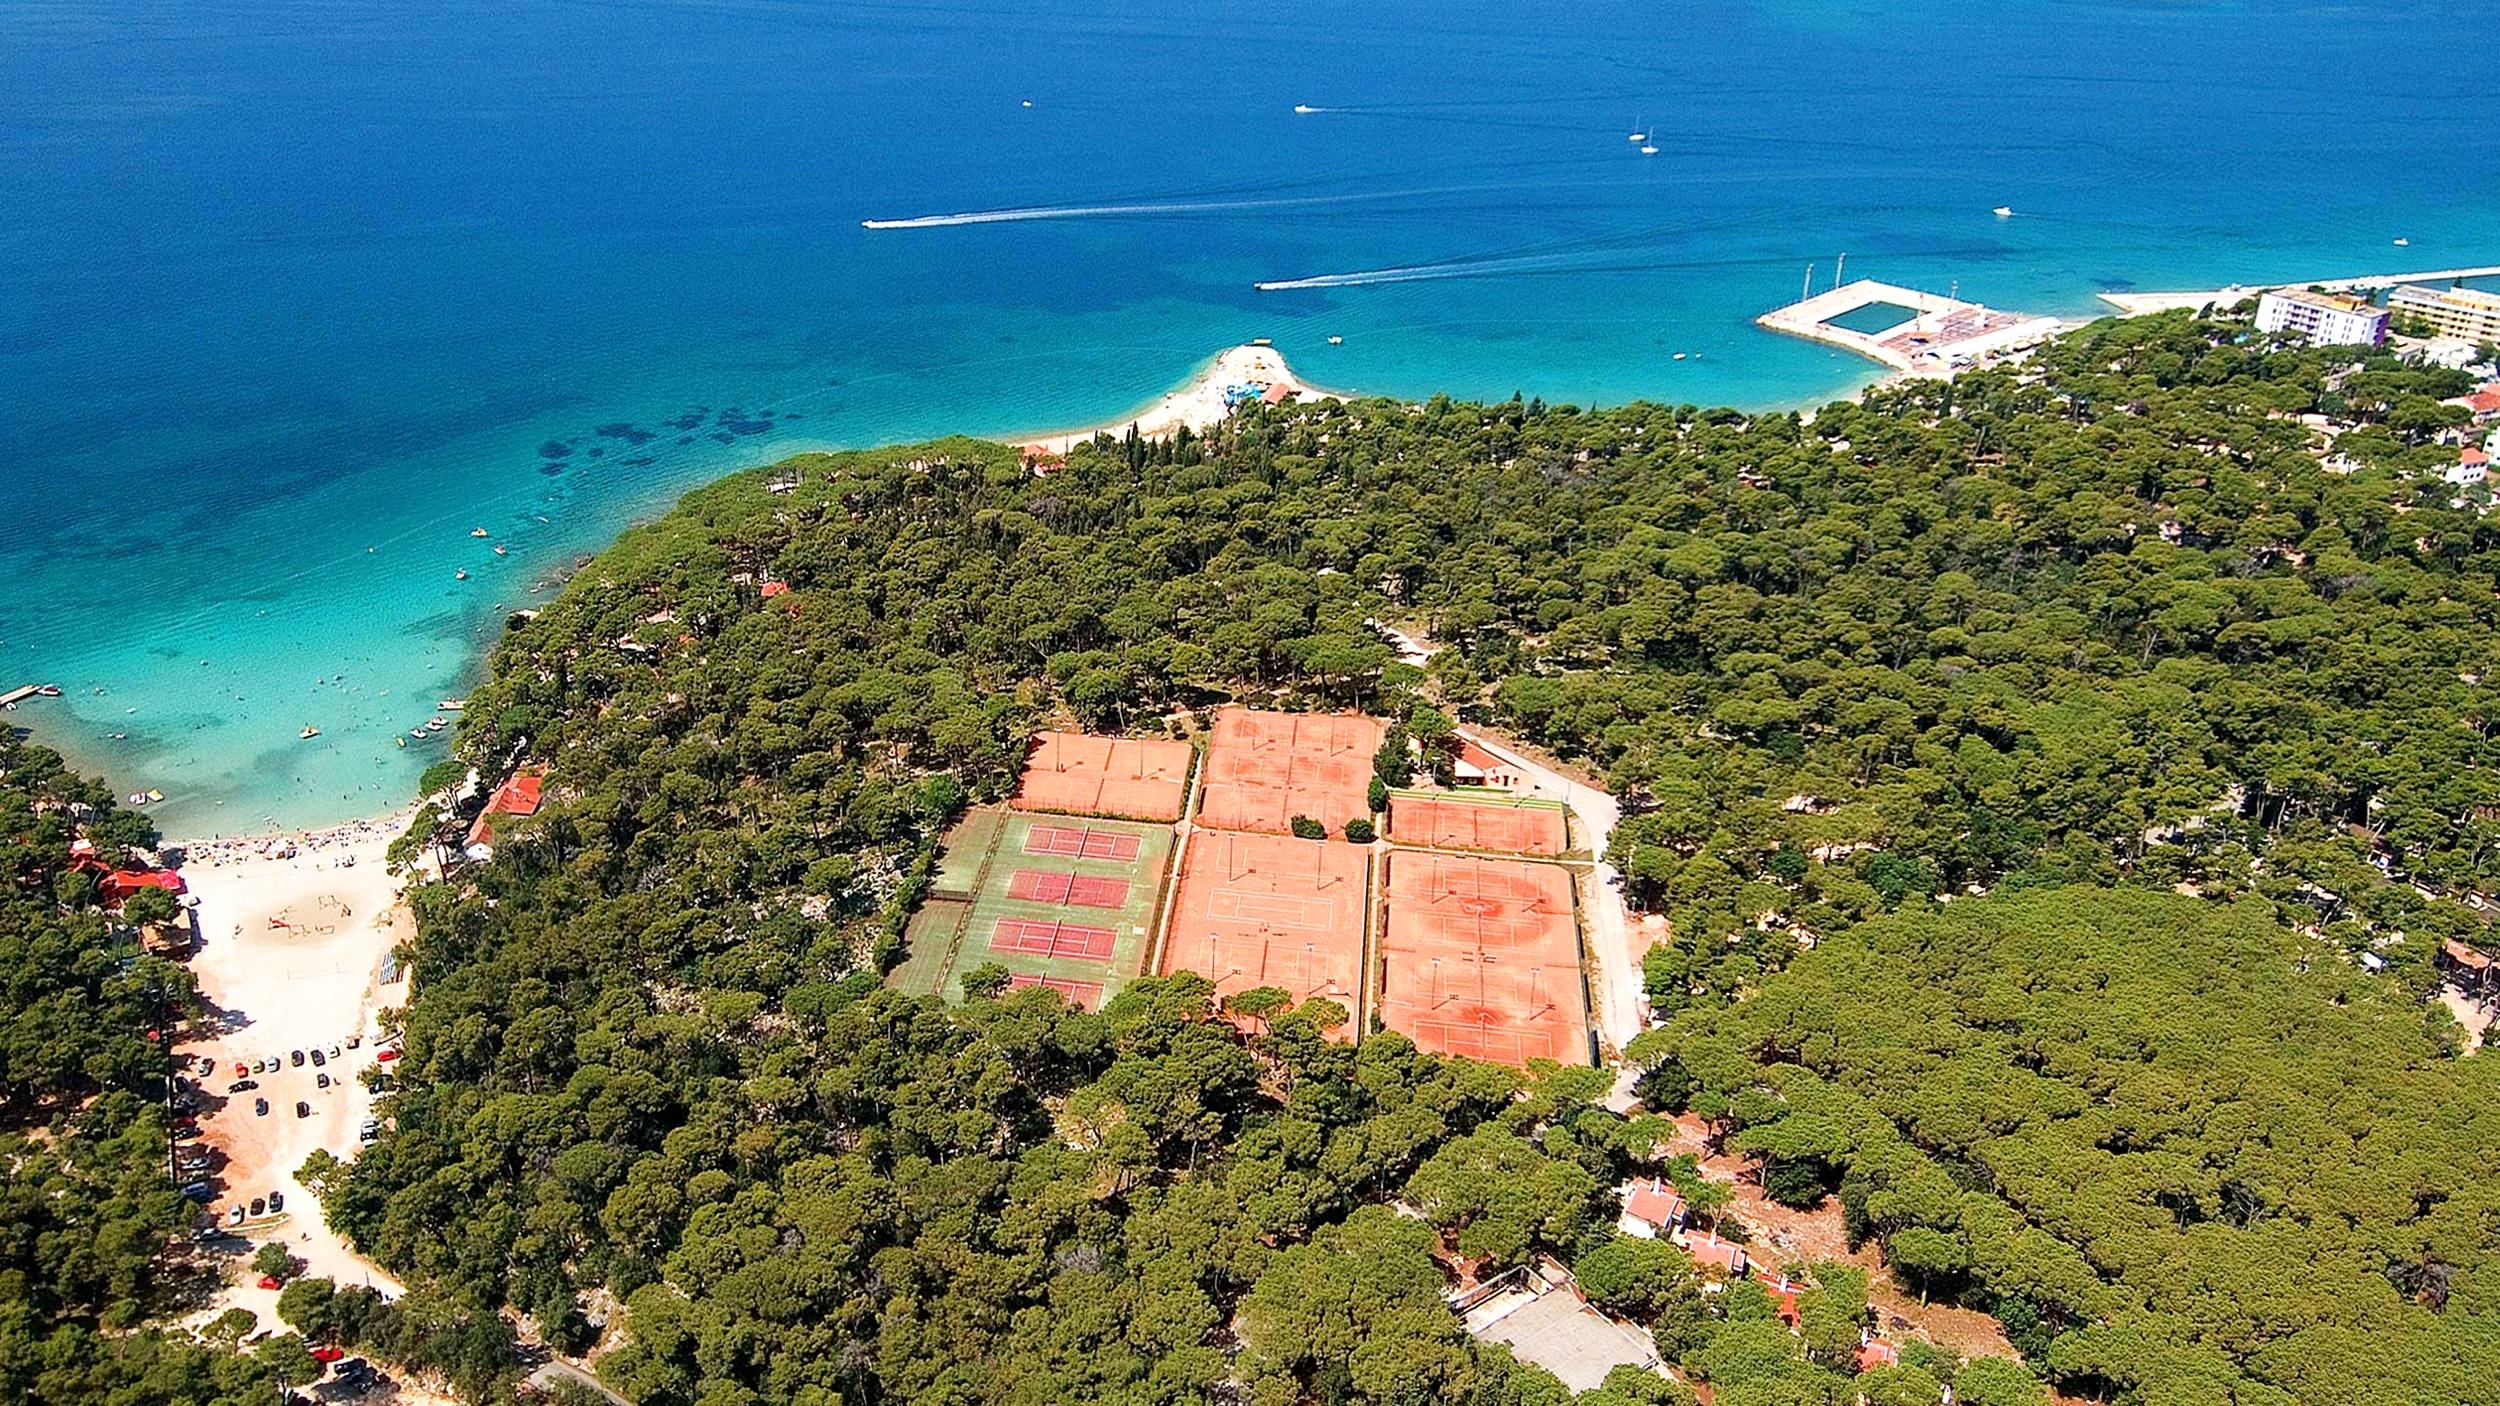 Sun soaked red clay tennis courts in Biograd na Moru, Zadar Region